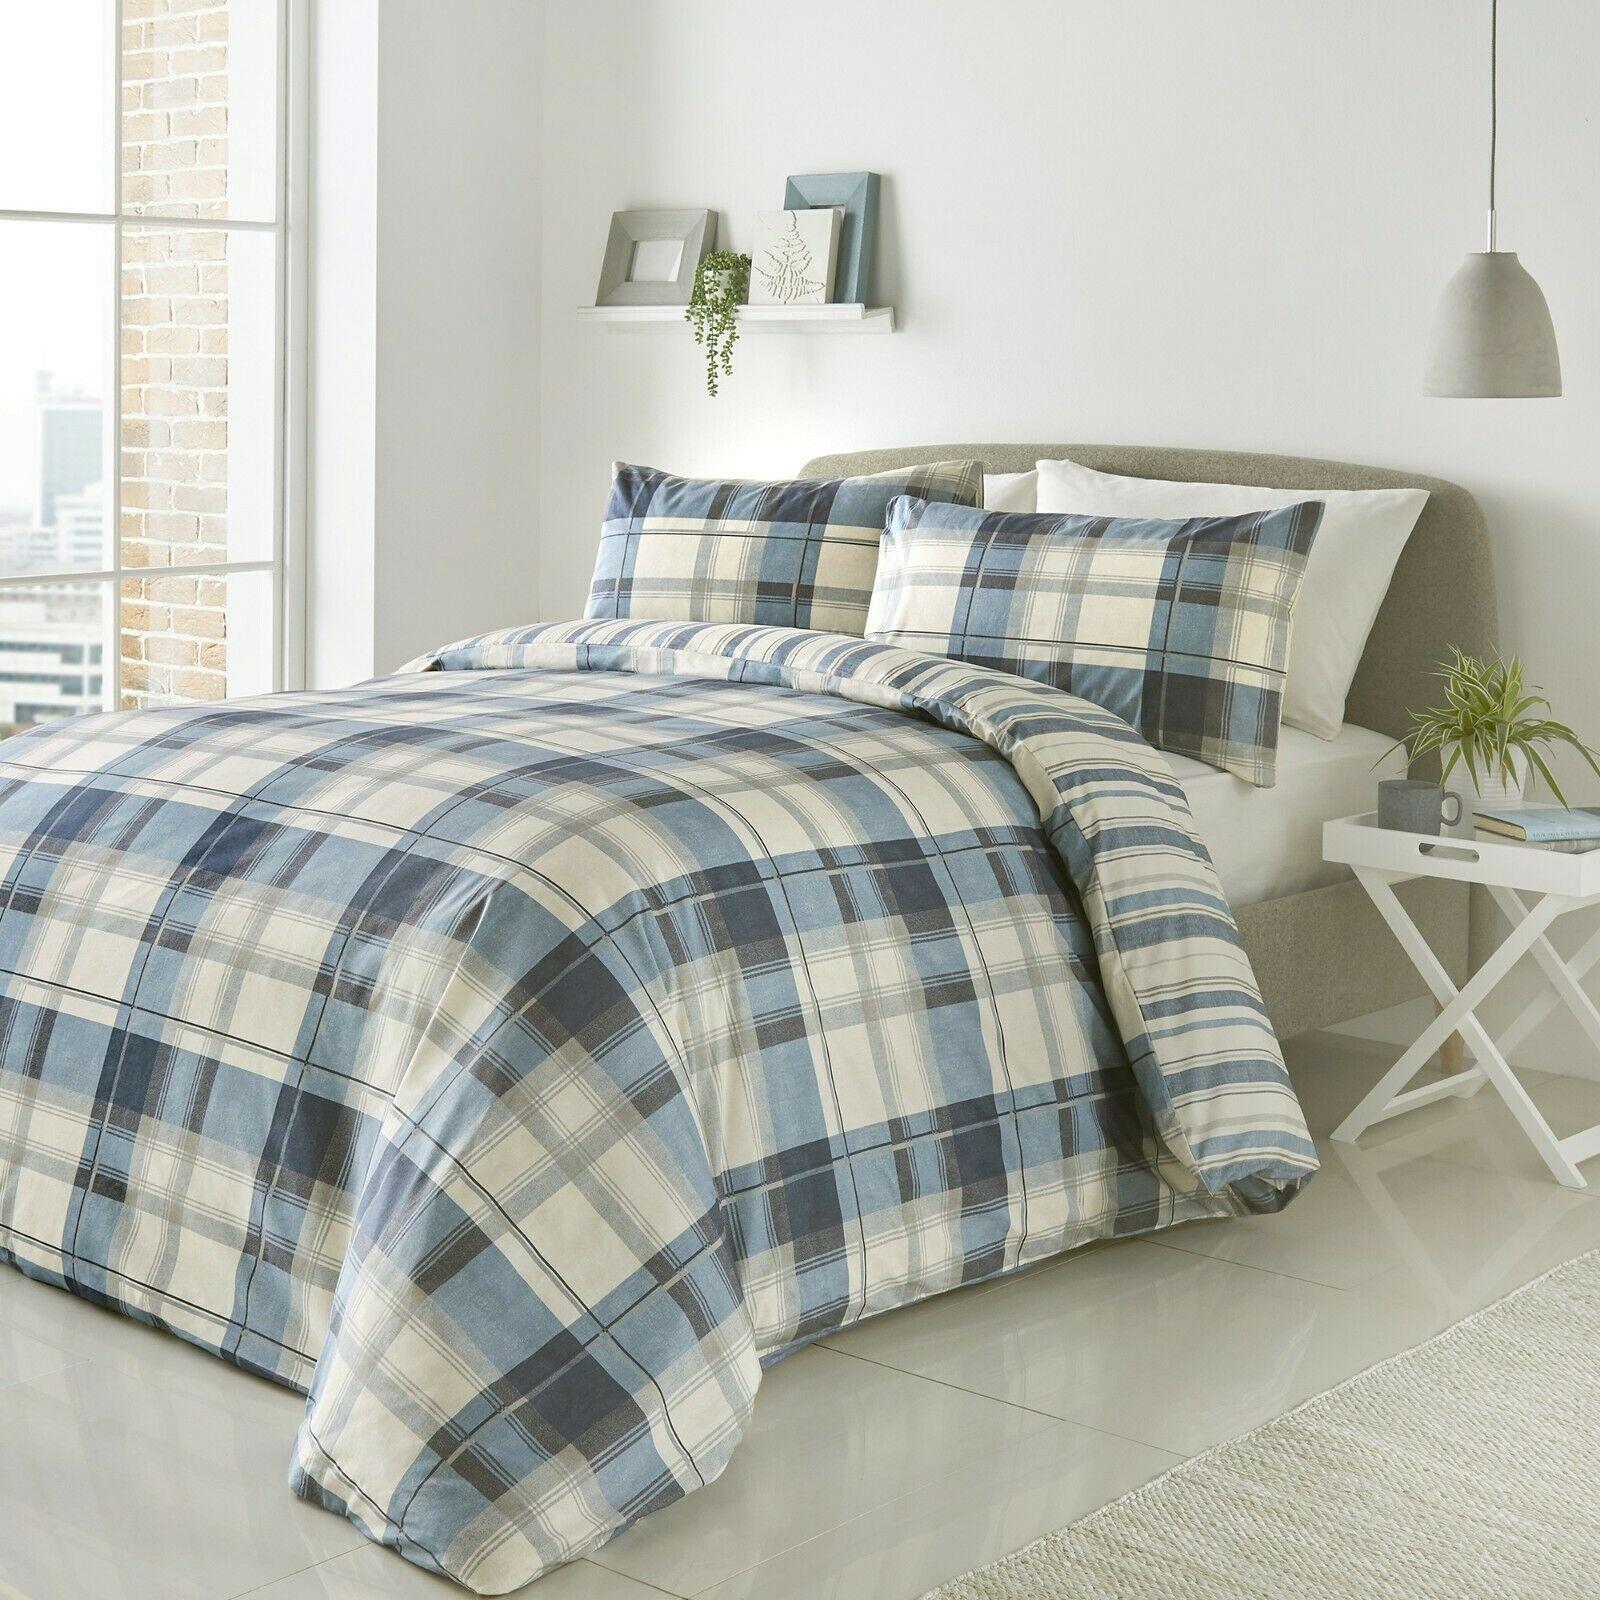 Tartan Stags Reversible Duvet Quilt Cover Bed Set Inc Matching Pillowcases